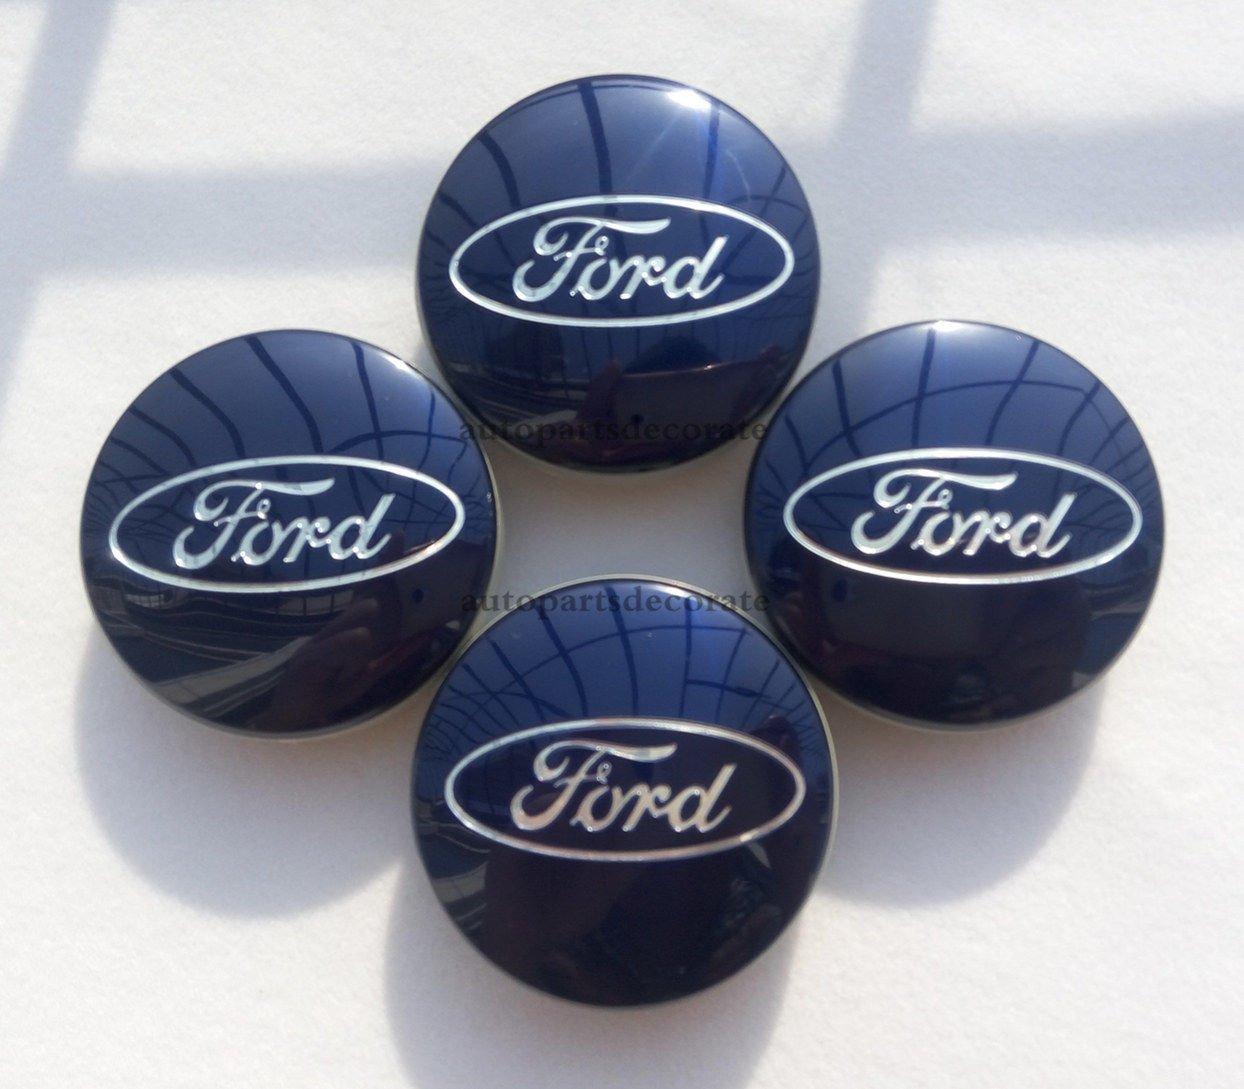 AOWIFT 4 x 54mm Nissan Car Badge Logo Car Wheel Center Hub Caps Wheel Emblem Covers